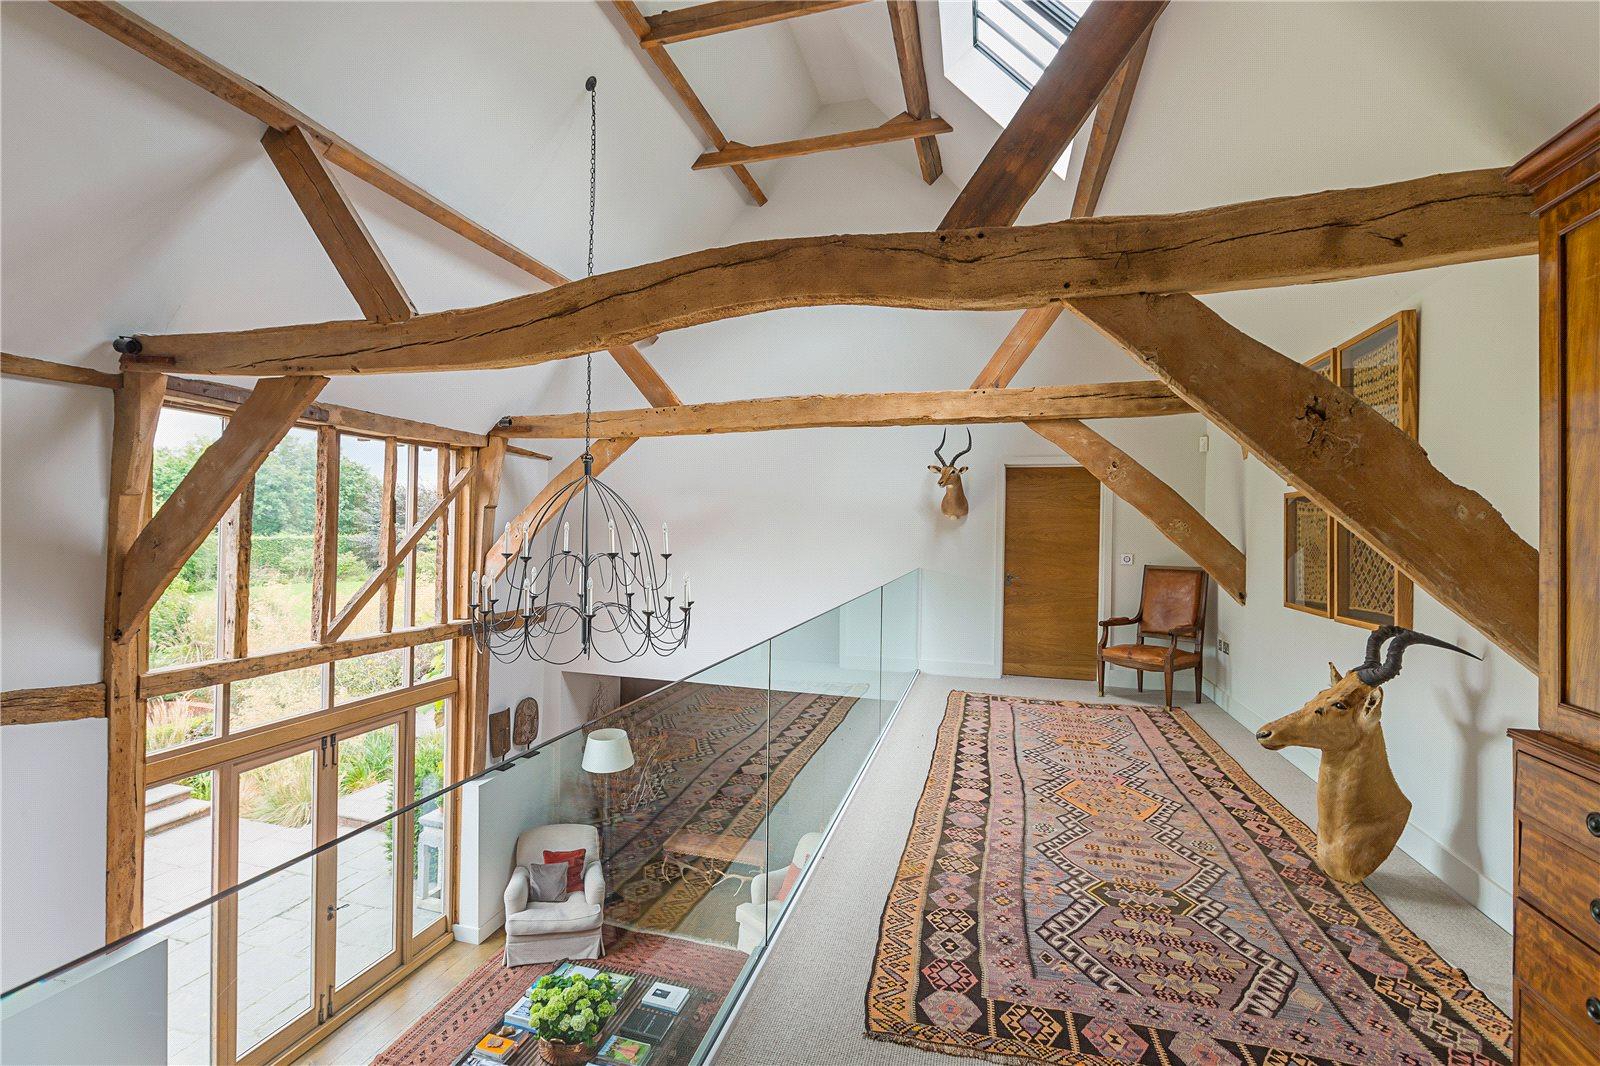 Additional photo for property listing at Three Houses Lane, Codicote, Hitchin, Hertfordshire, SG4 Hitchin, Ingiltere